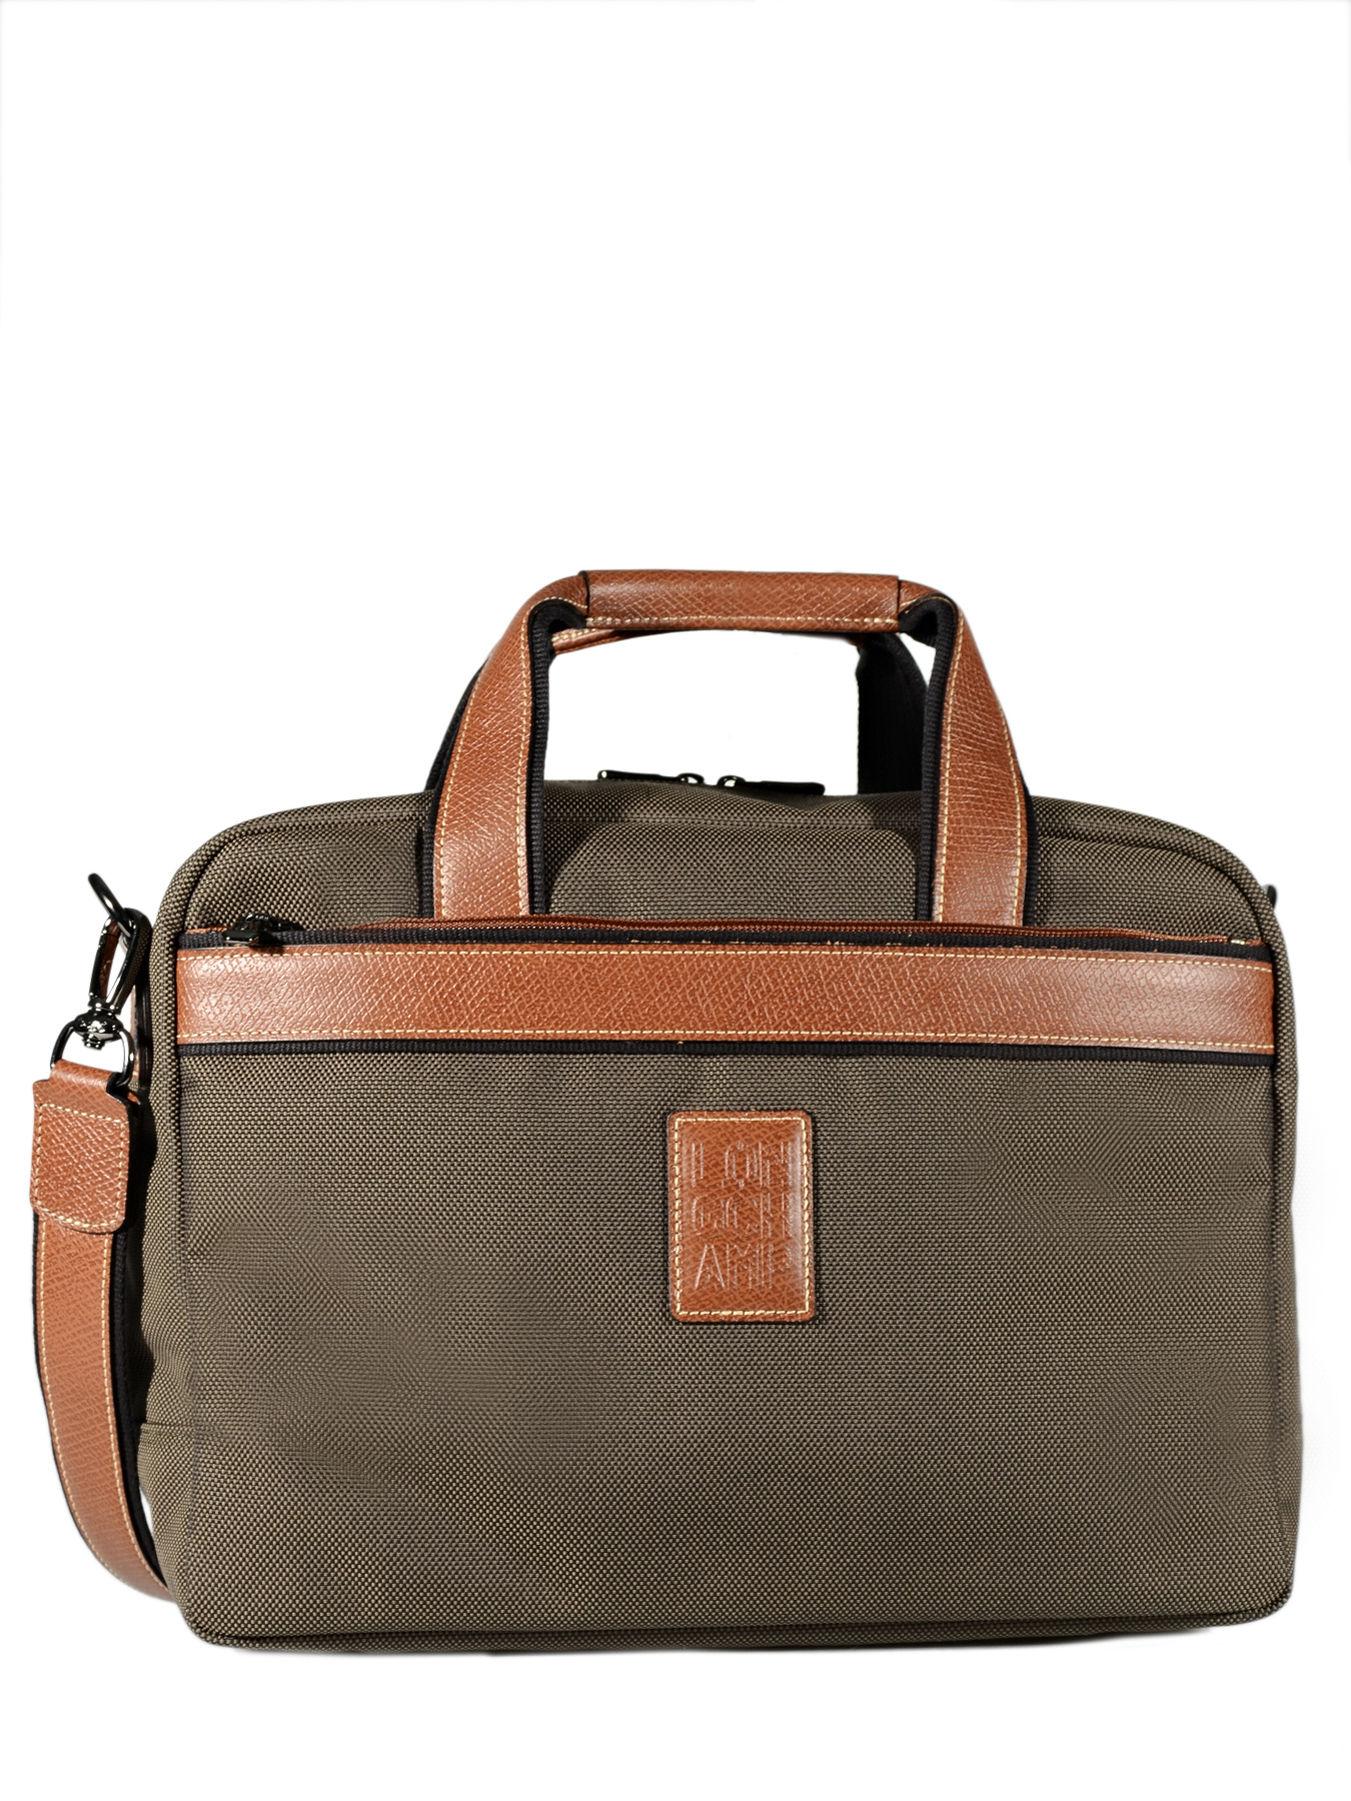 3cd09563f0e Sacs de voyage Longchamp 1658080 brun boxford en vente au meilleur prix